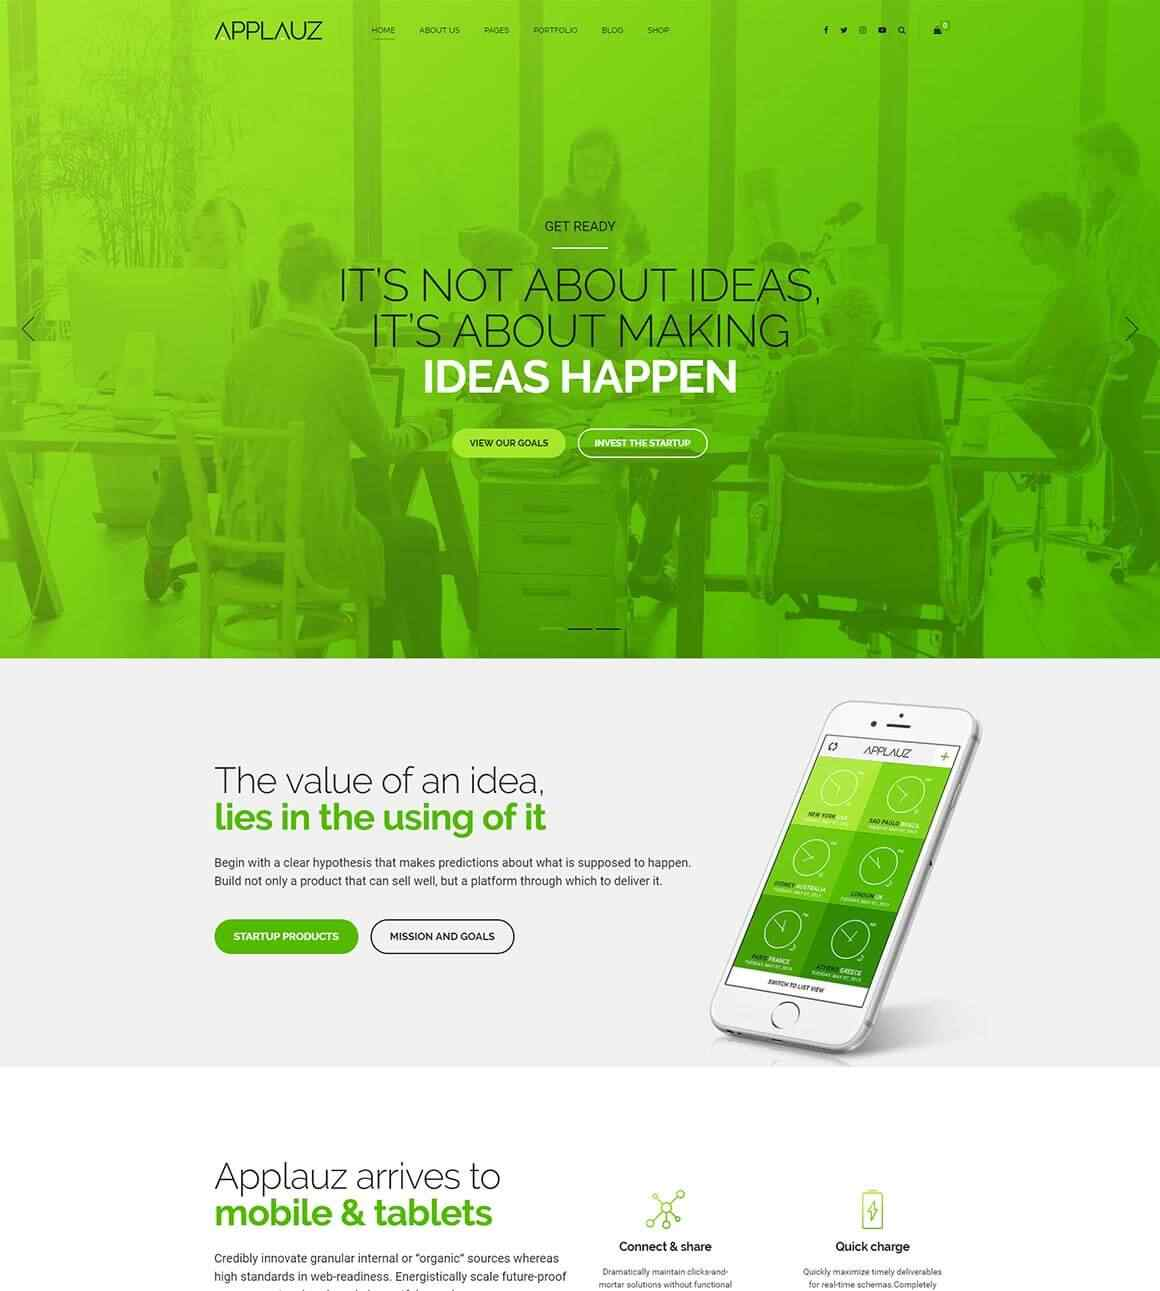 https://www.mediaircare.de/wp-content/uploads/2017/11/Screenshot-Startup.jpg